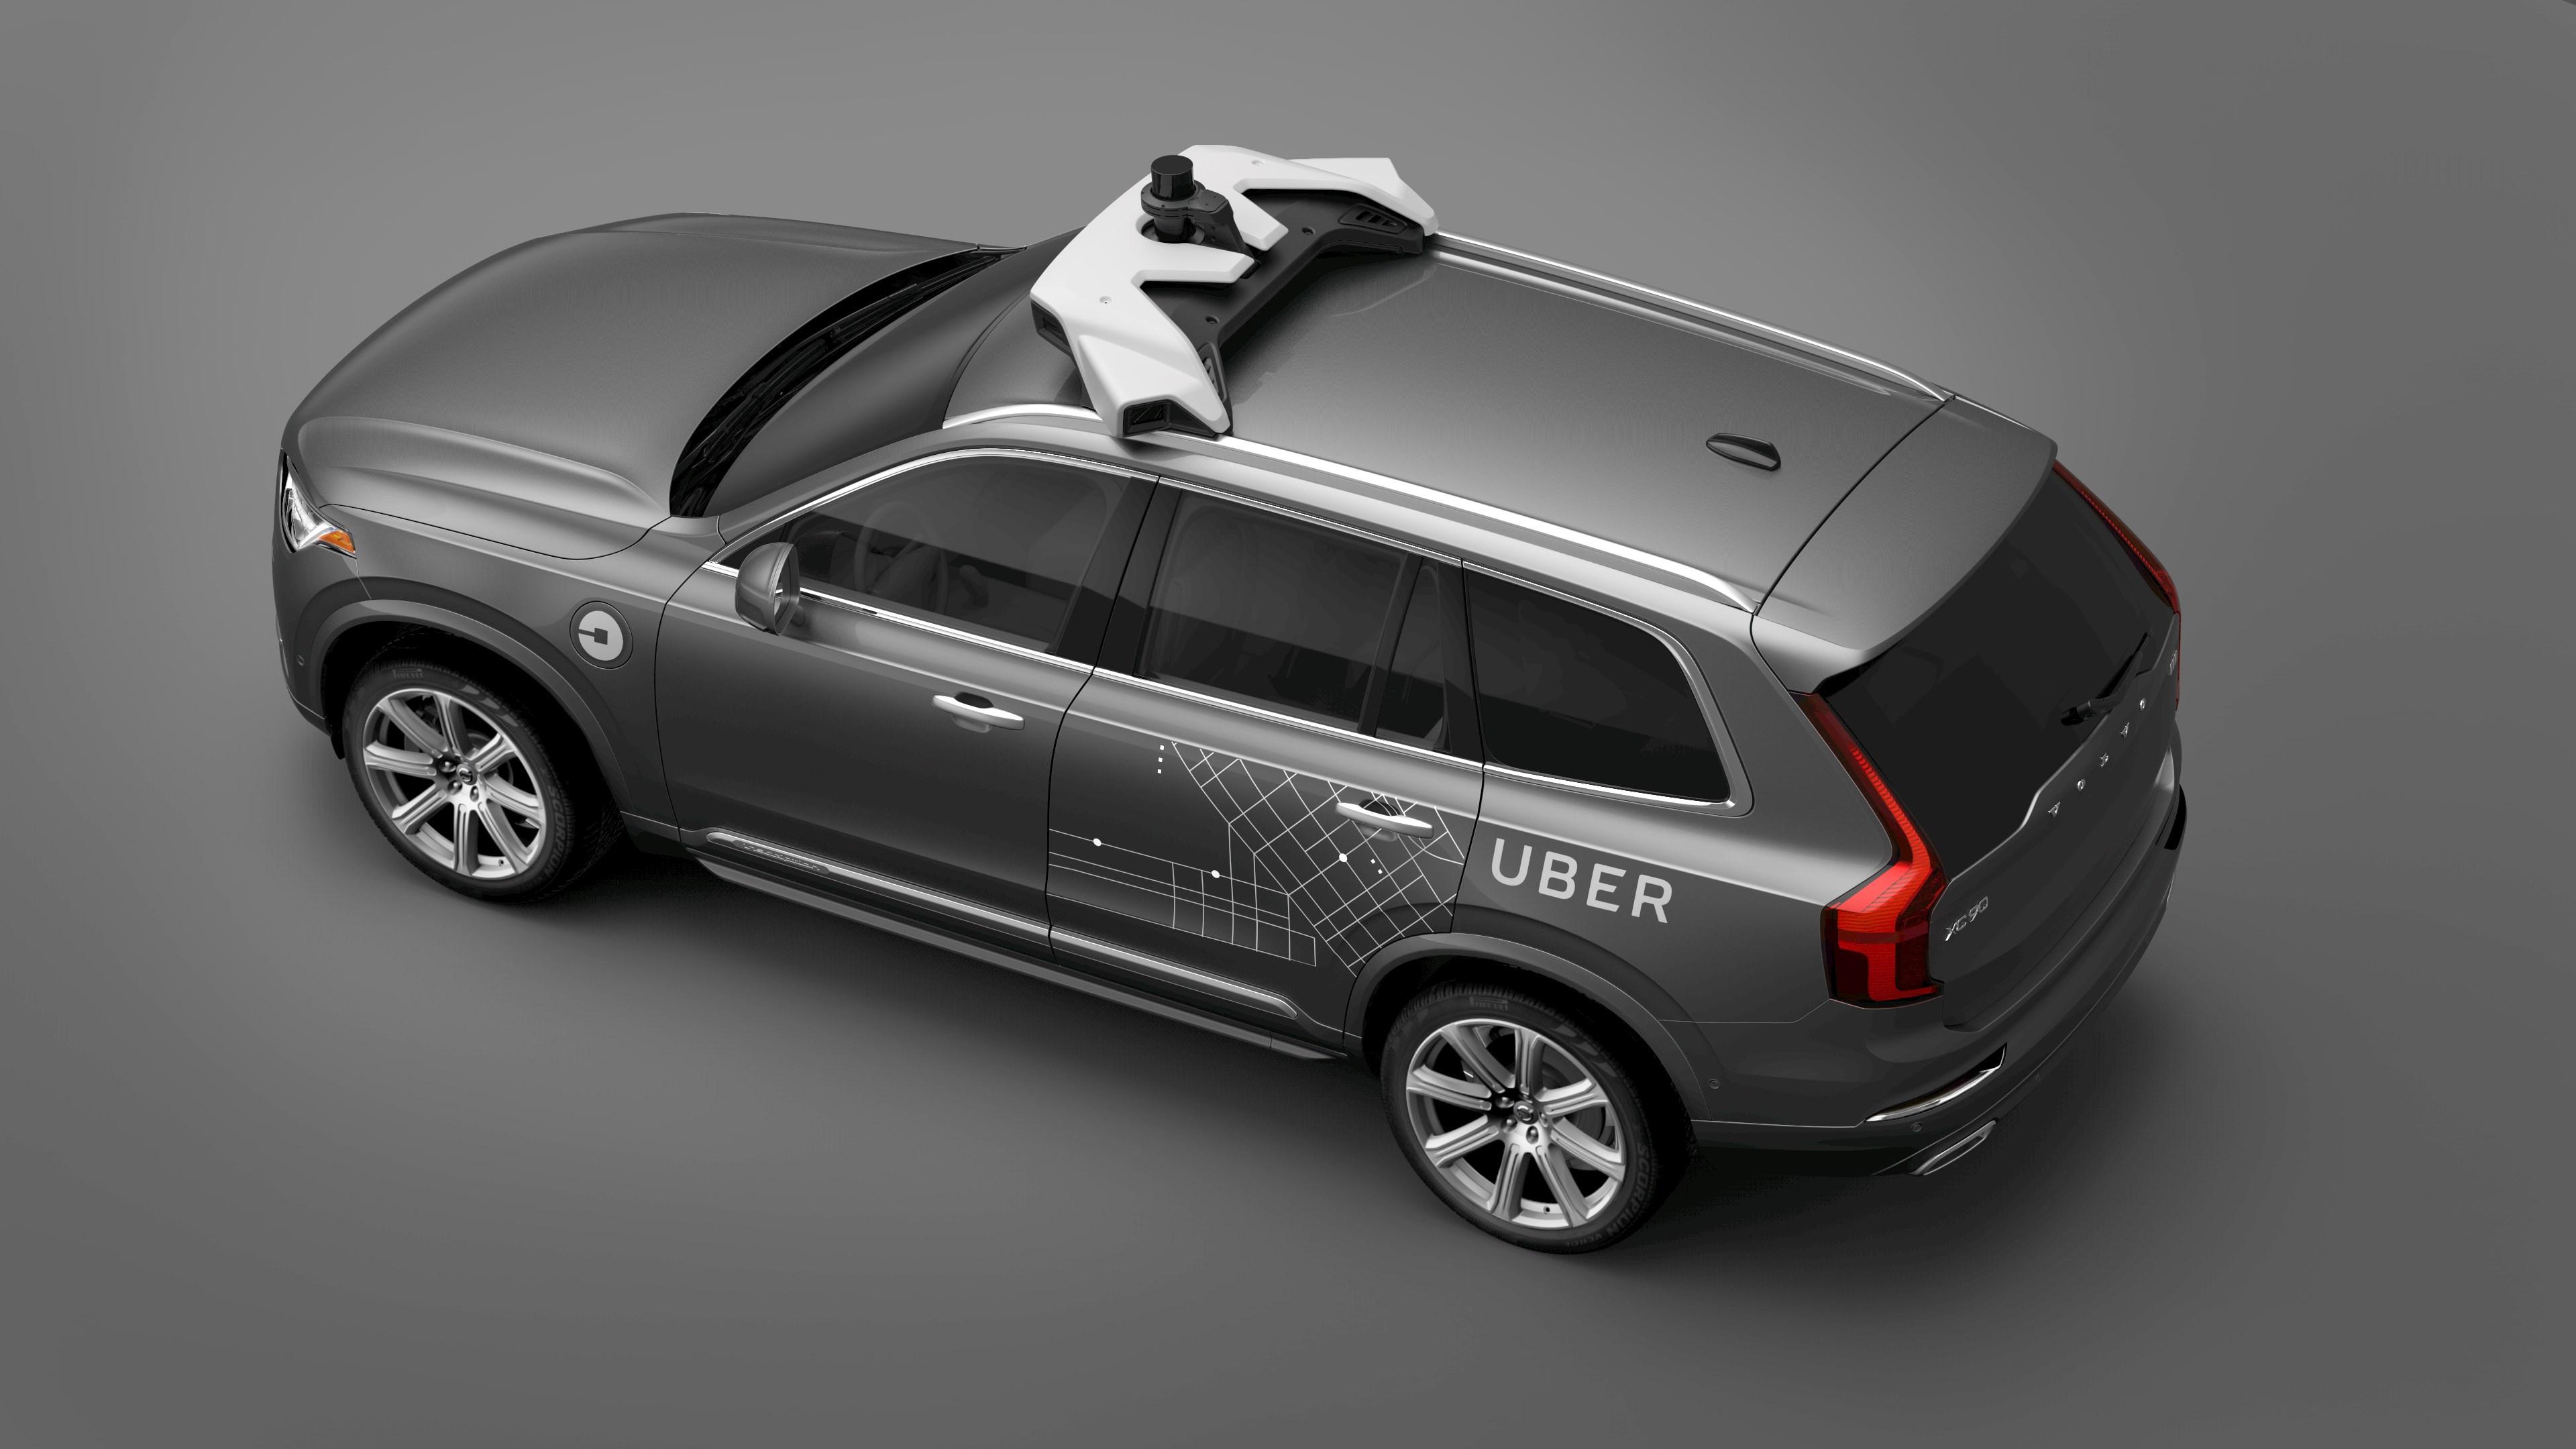 An Uber self-driving car